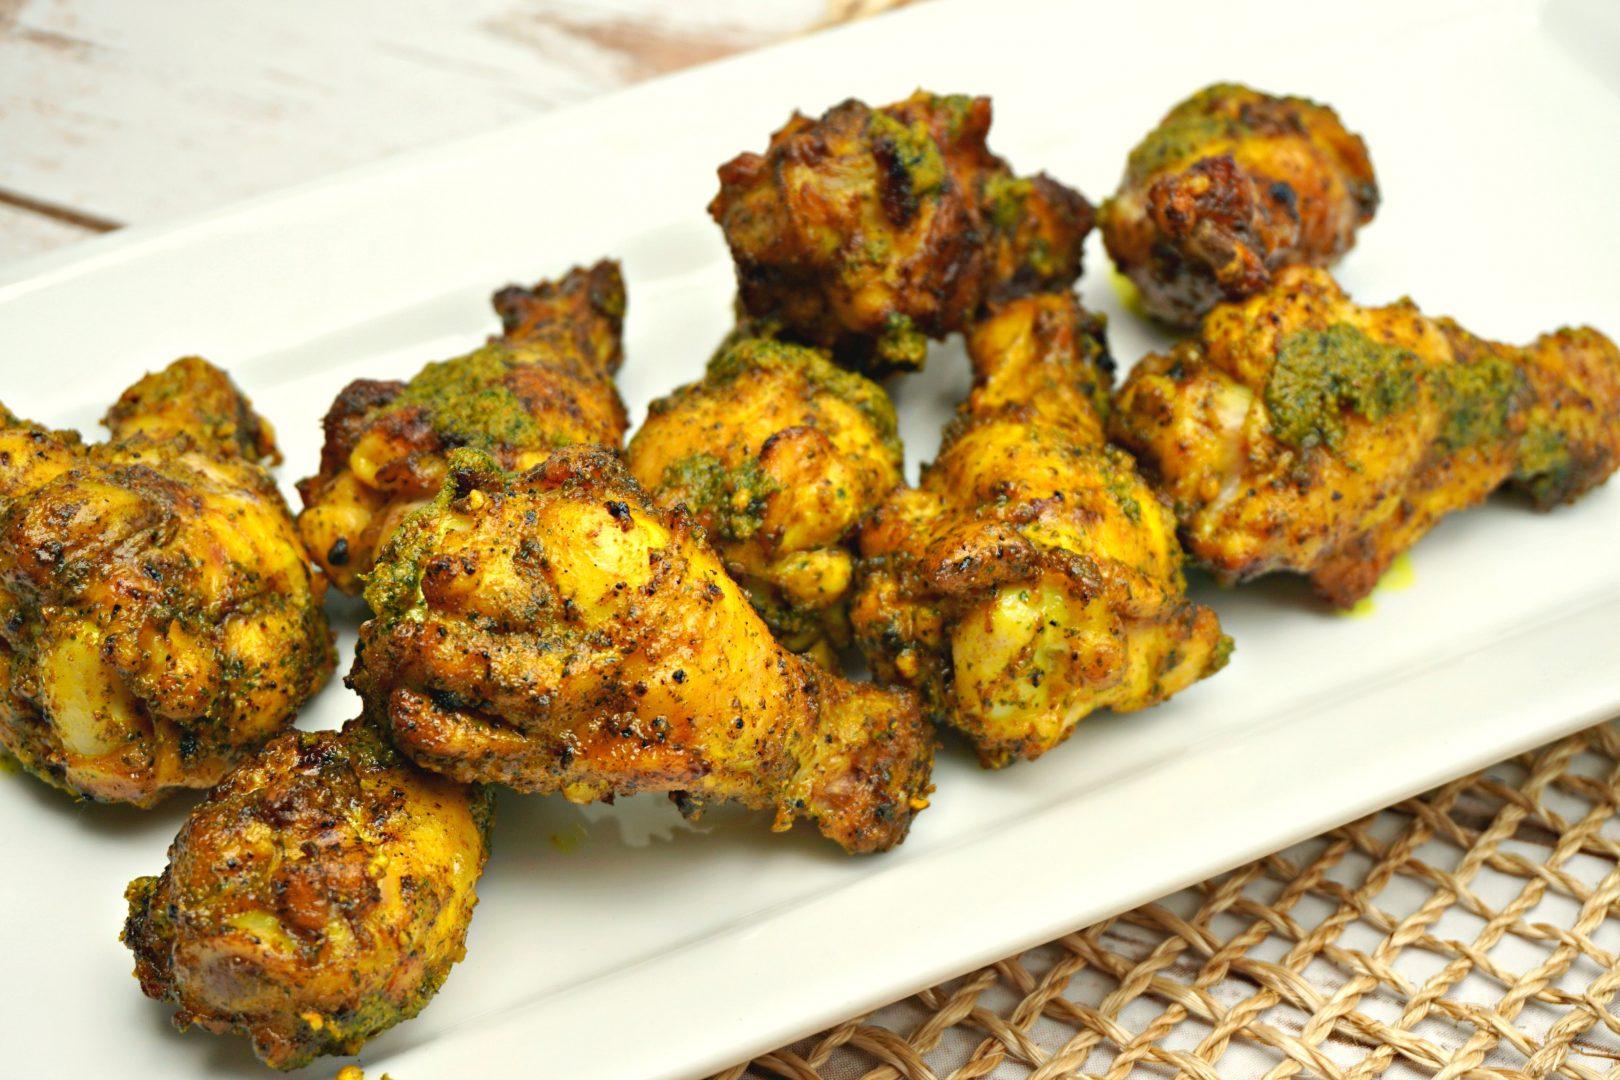 Lemongrass, Cilantro & Garlic Grilled Chicken Wings